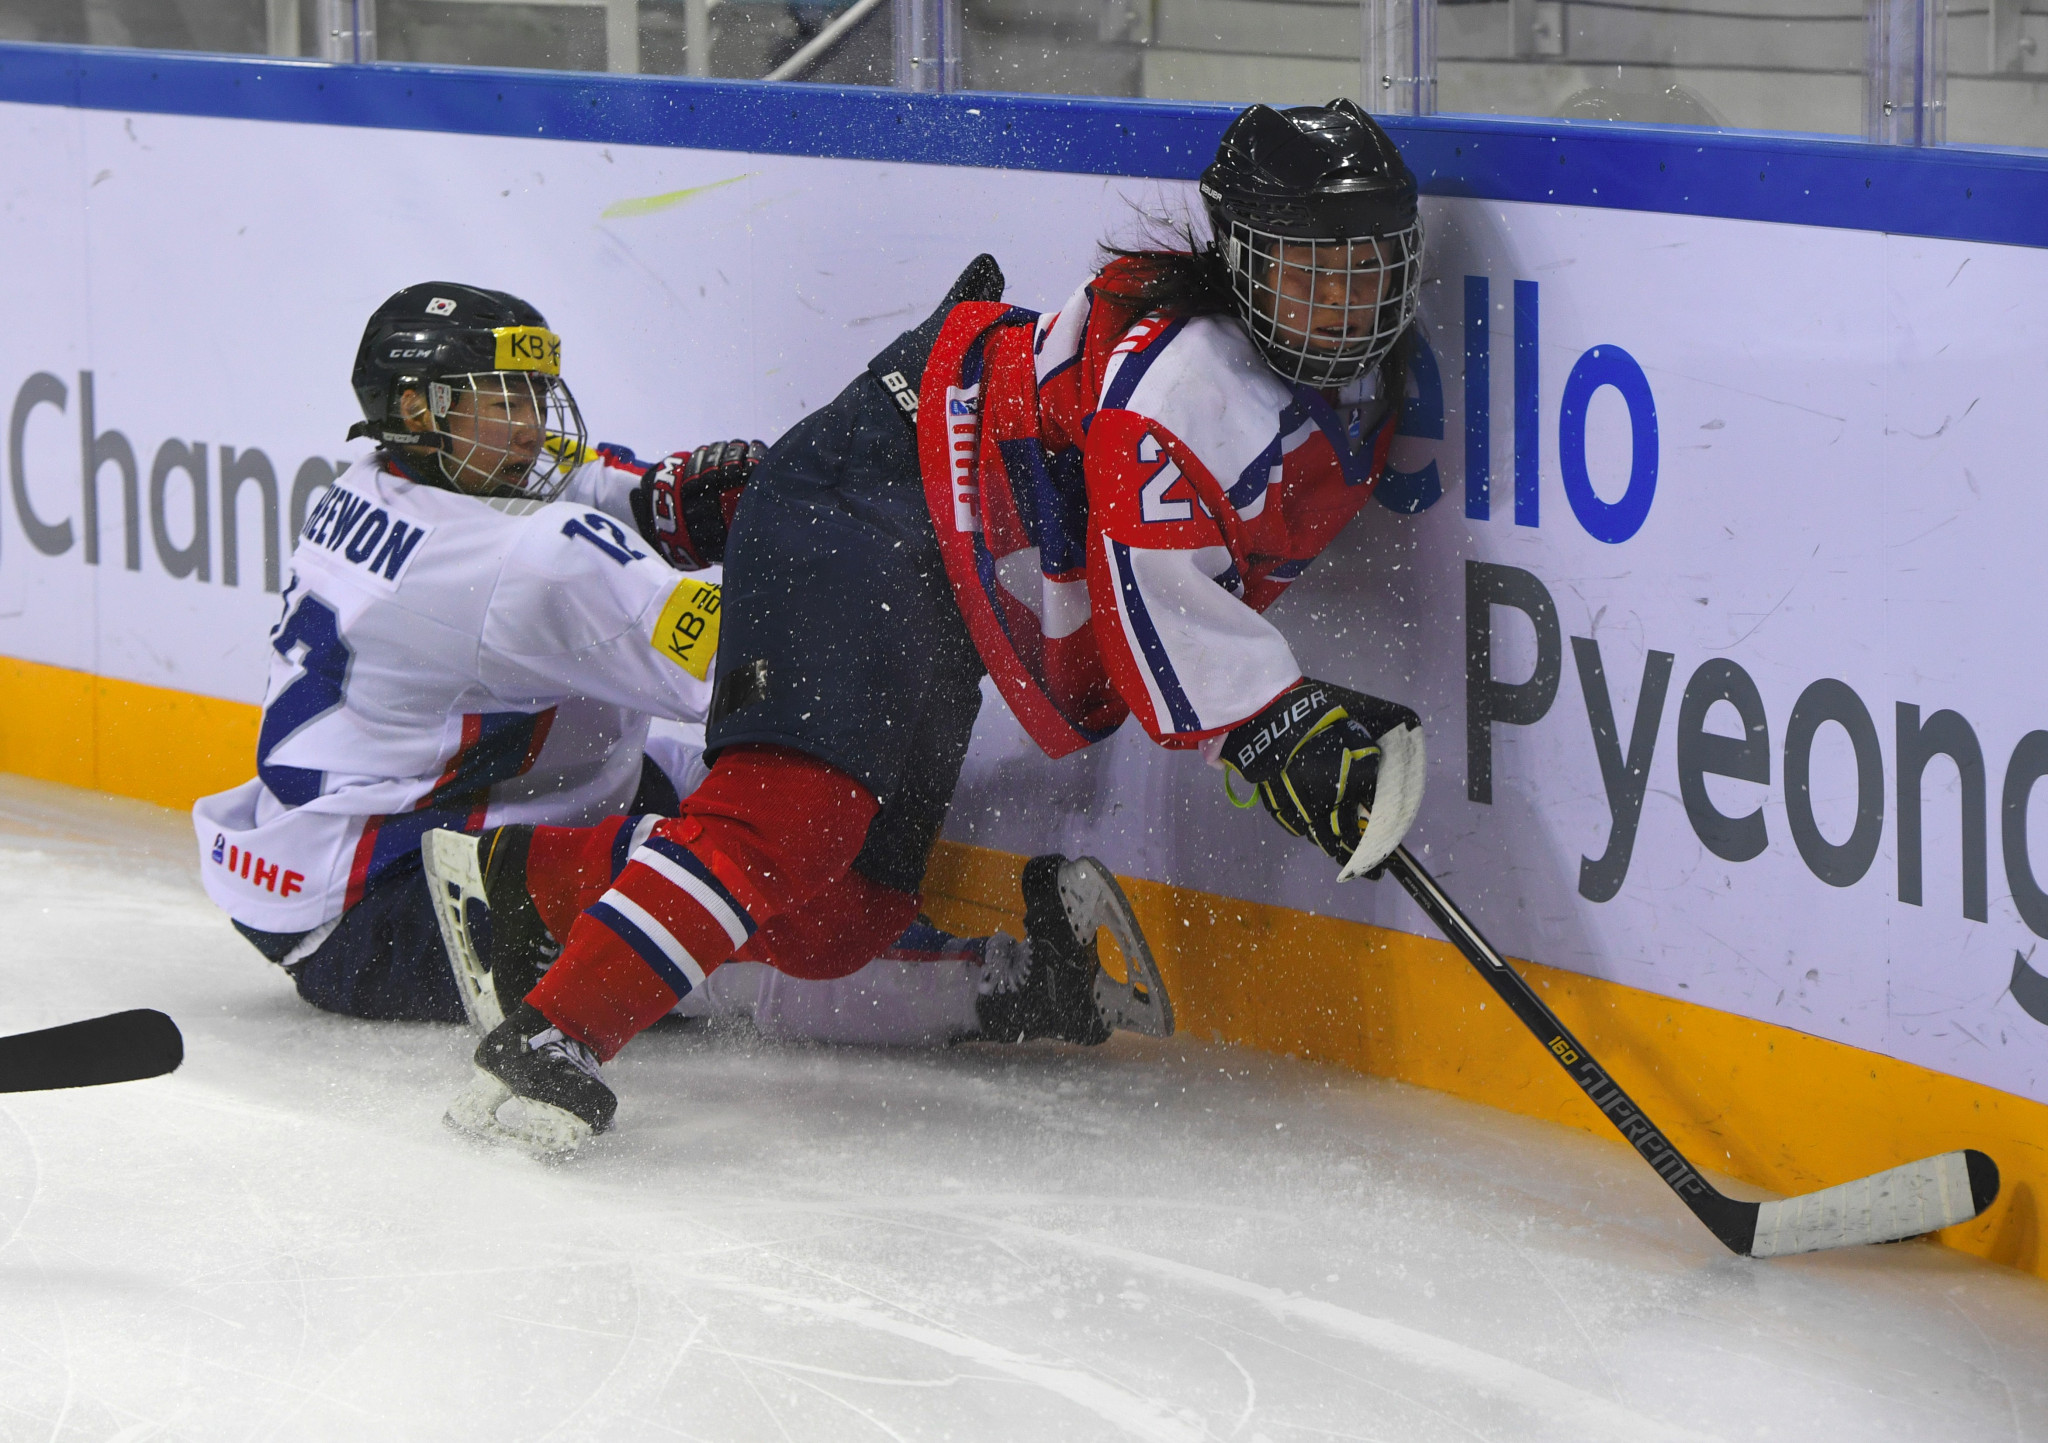 Concerns still surround the Pan-Korean ice hockey team ©Getty Images